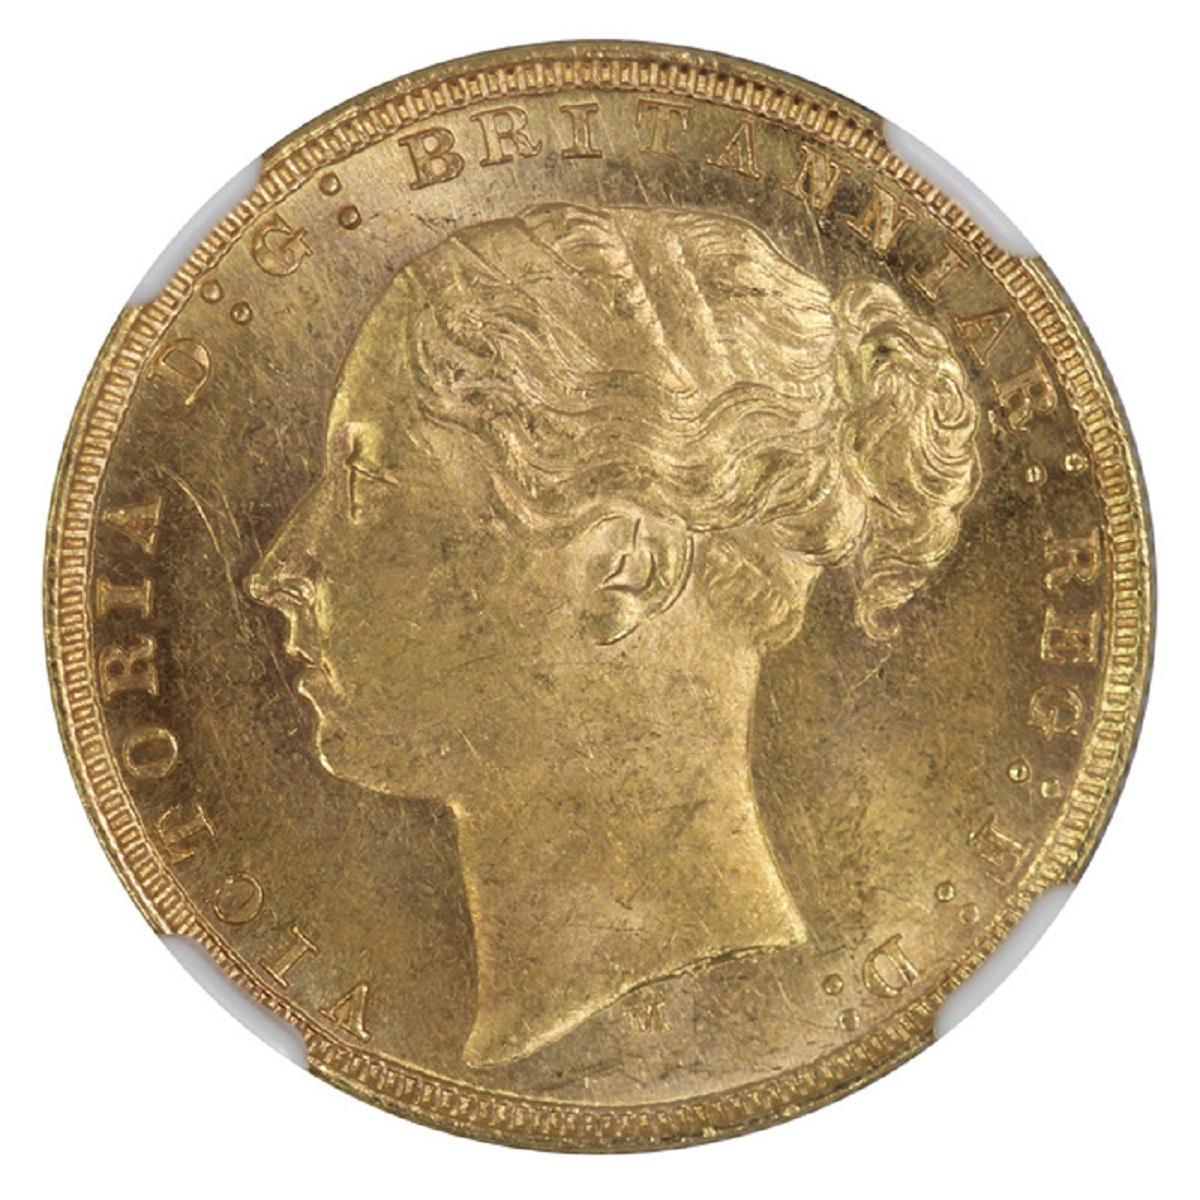 Australia. 1879 M 'St George' Sovereign, NGC MS62